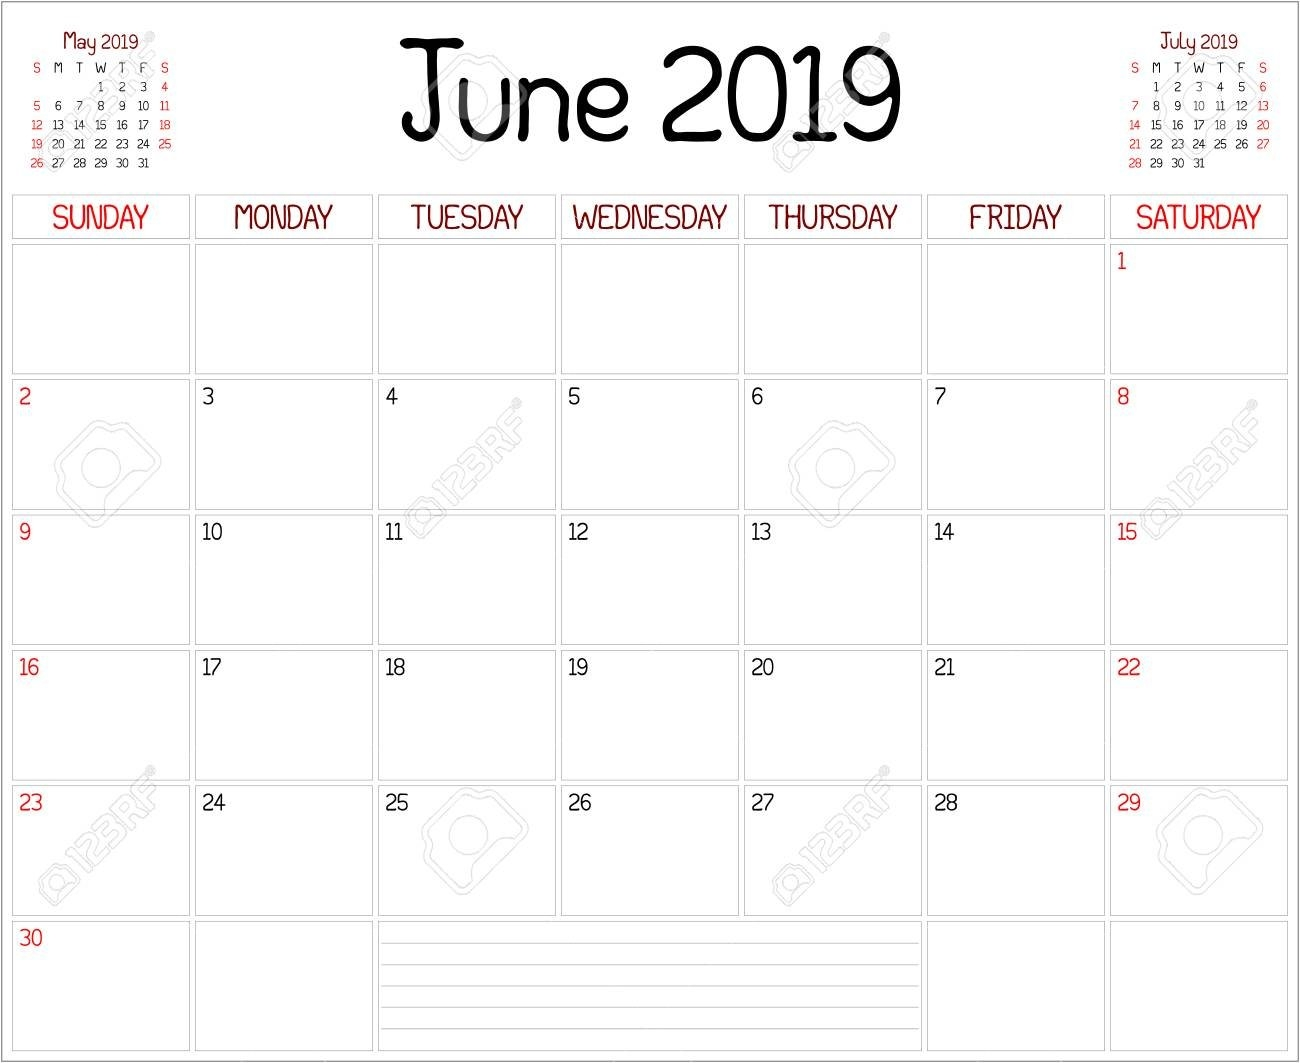 Year 2019 June Planner – A Monthly Planner Calendar For June 9/2019 Calendar